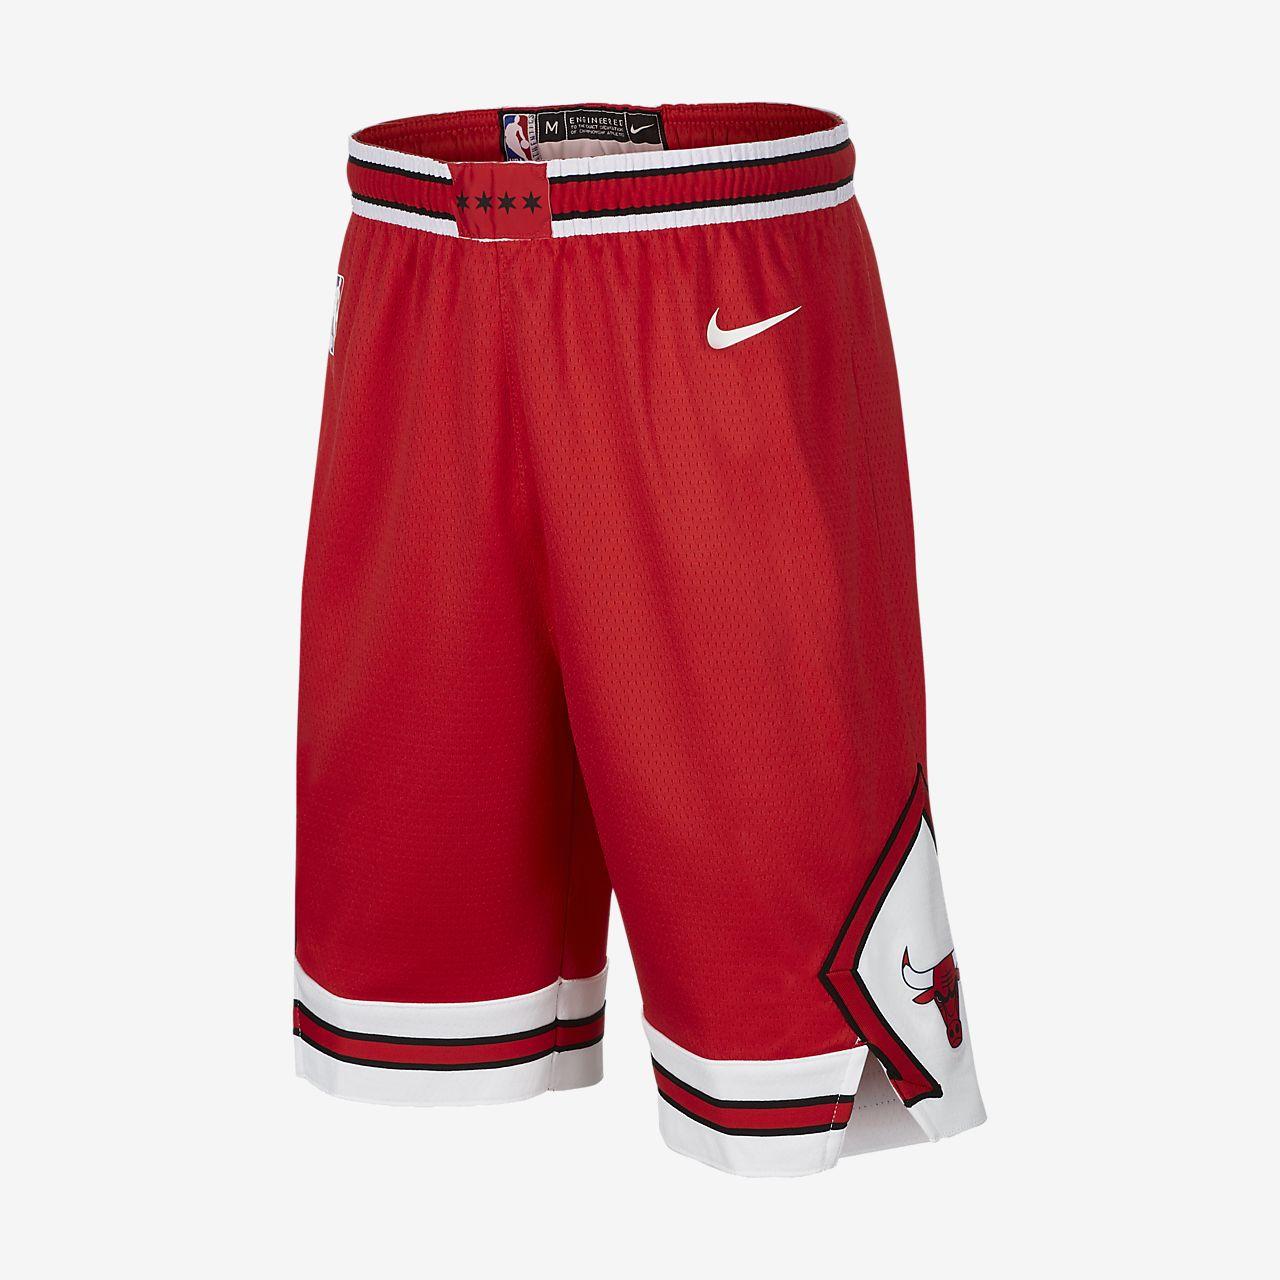 芝加哥公牛队 Nike Icon Edition SwingmanNBA 大童(男孩)短裤